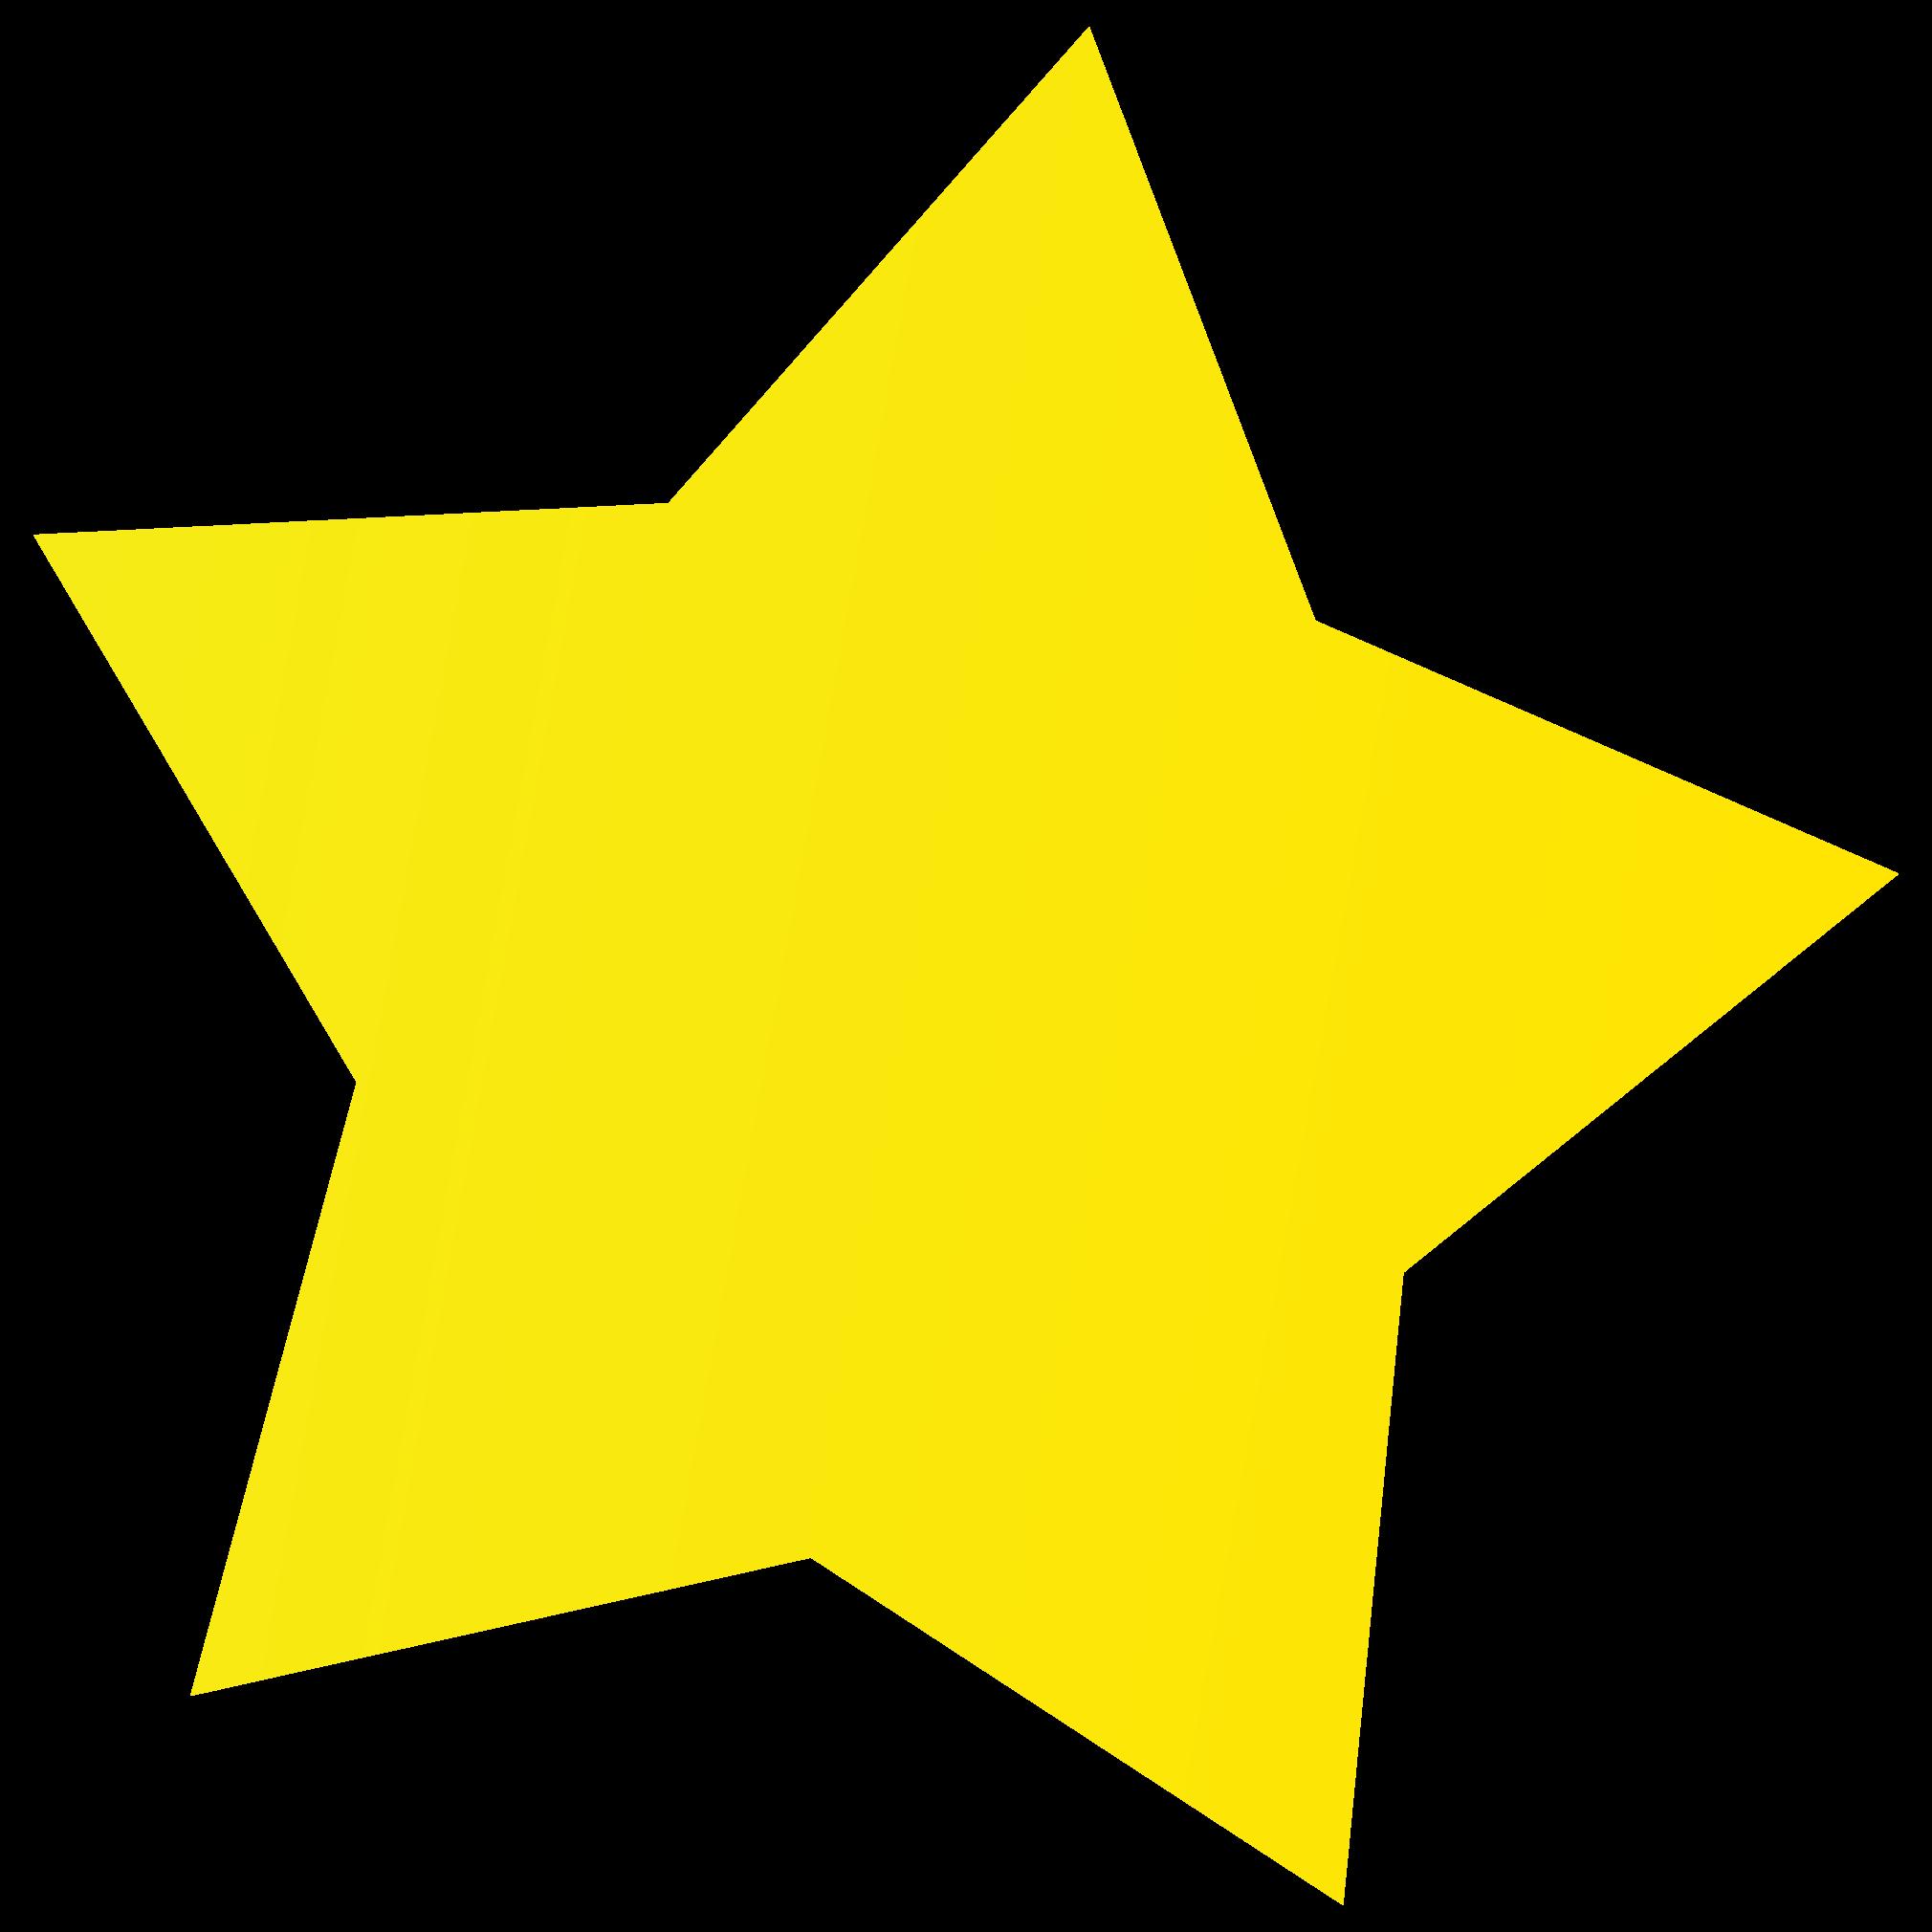 Clip Art Star Png ClipArt Best-Clip Art Star Png ClipArt Best-18